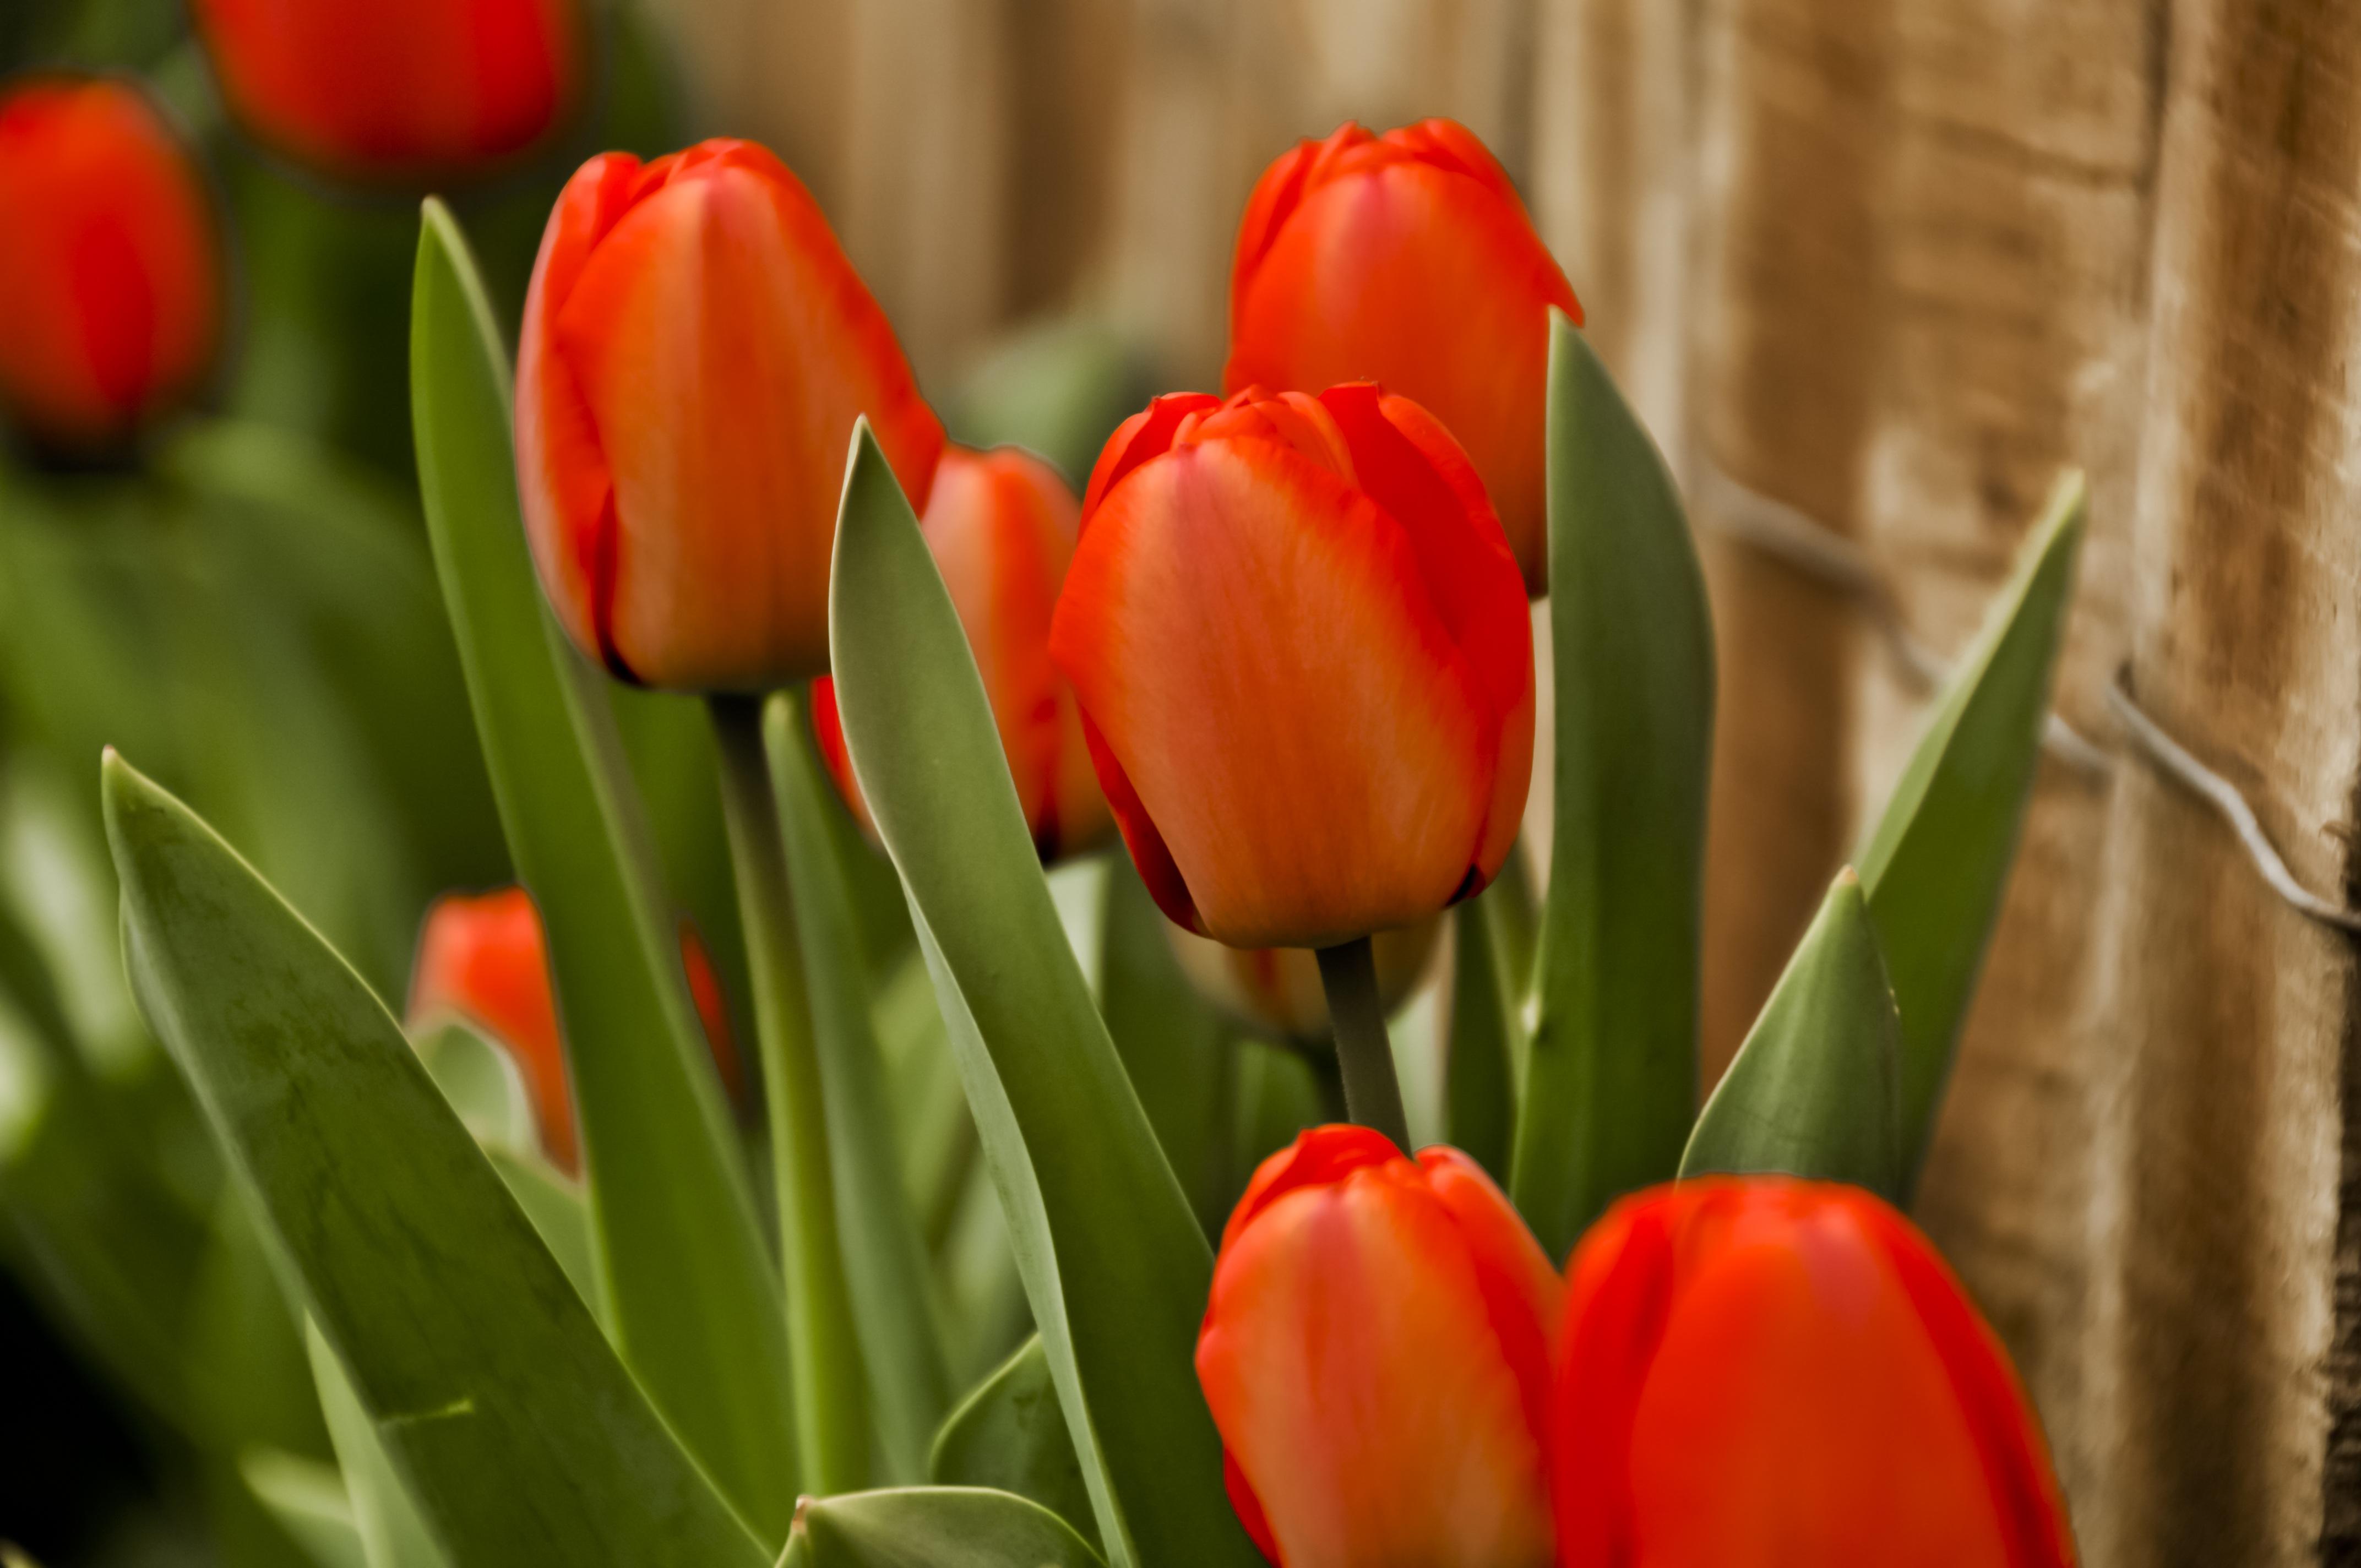 Фото картинки тюльпанов